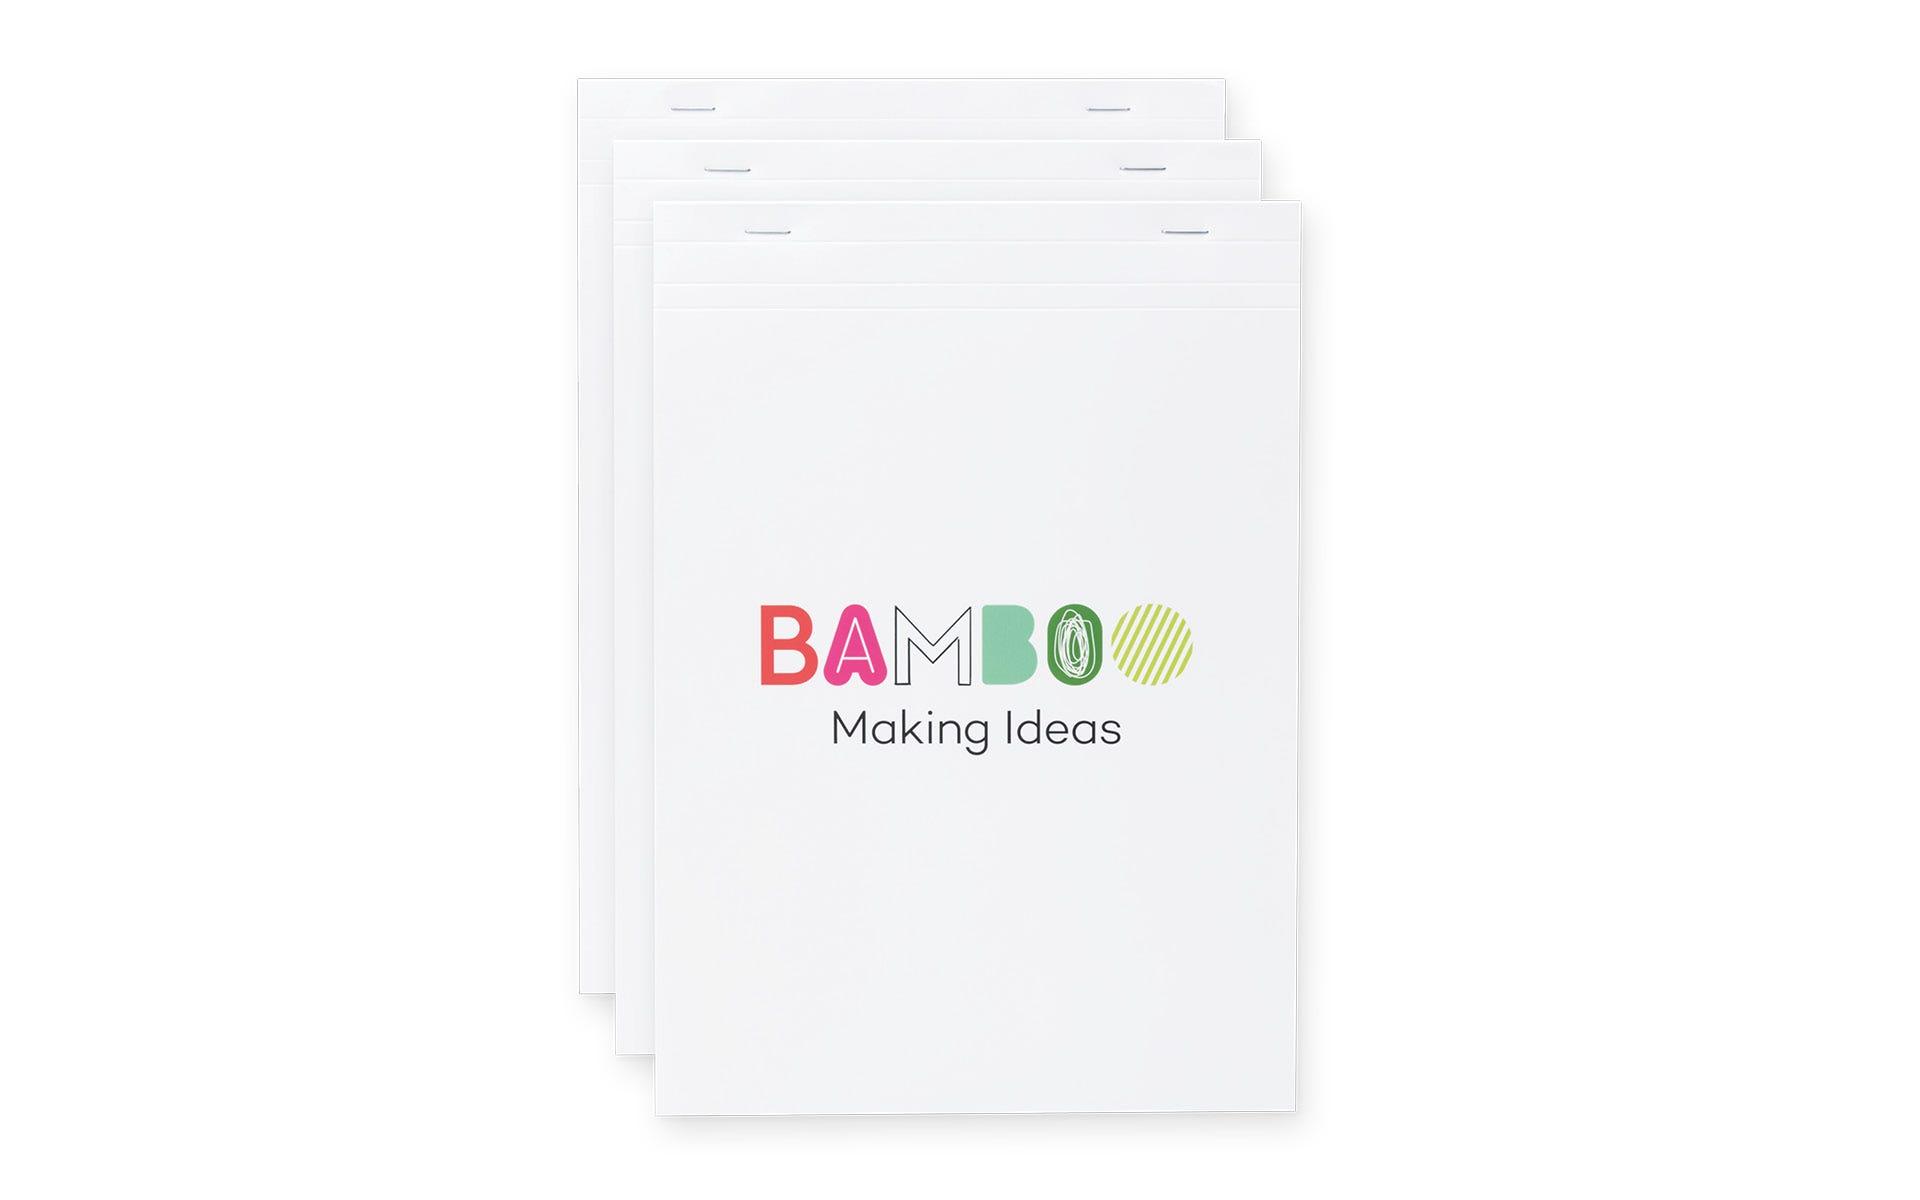 Bamboo Folio / Slate notepads, A4